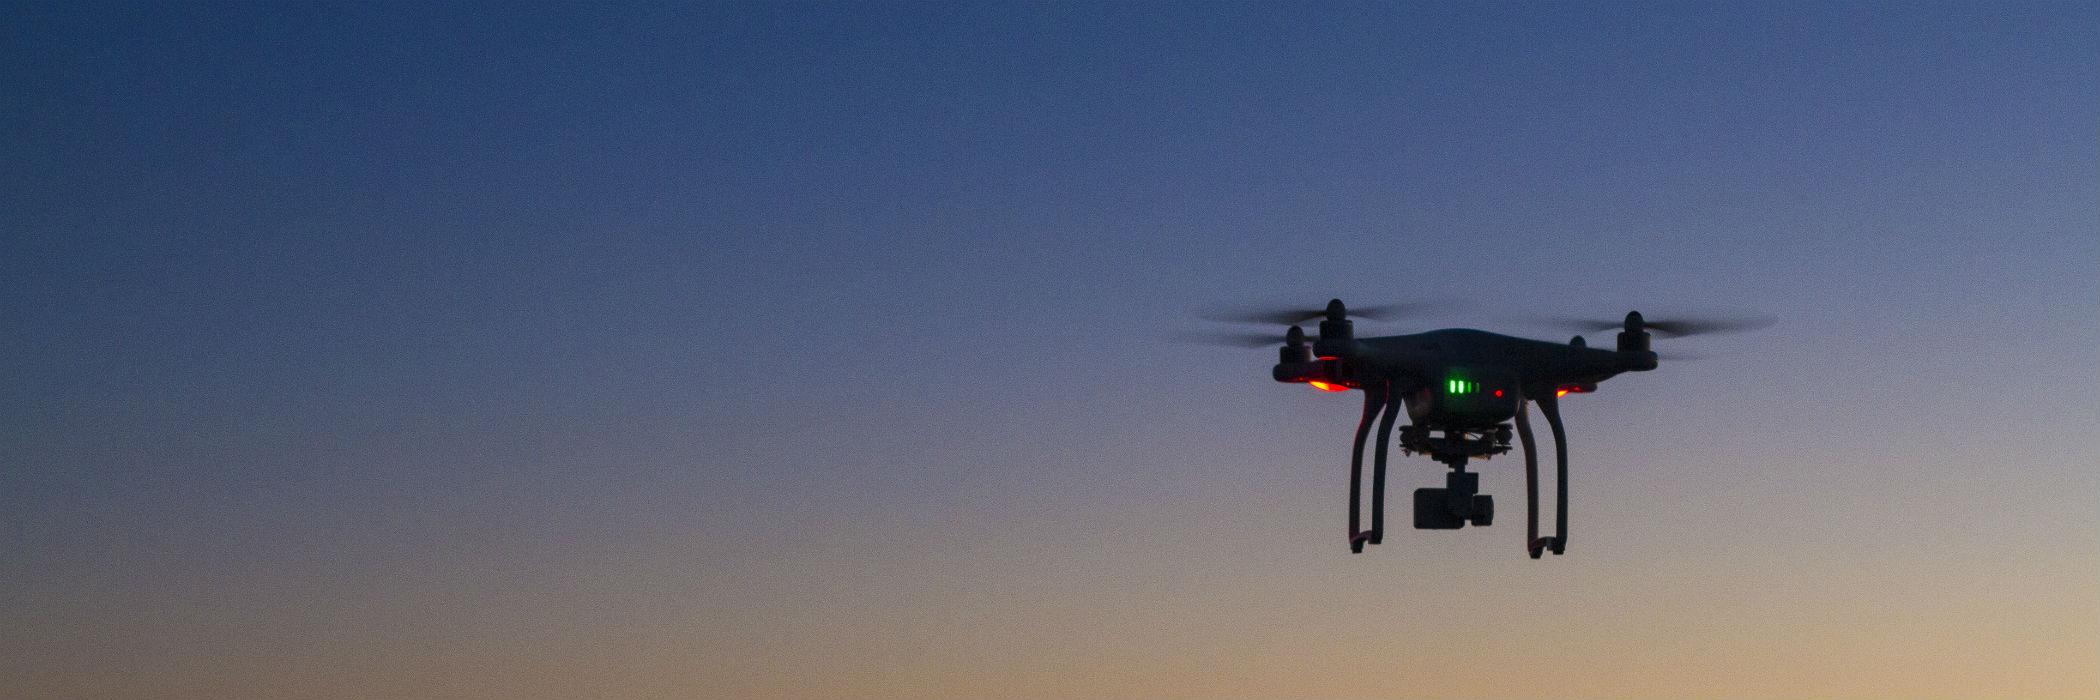 sUAS flying at dusk